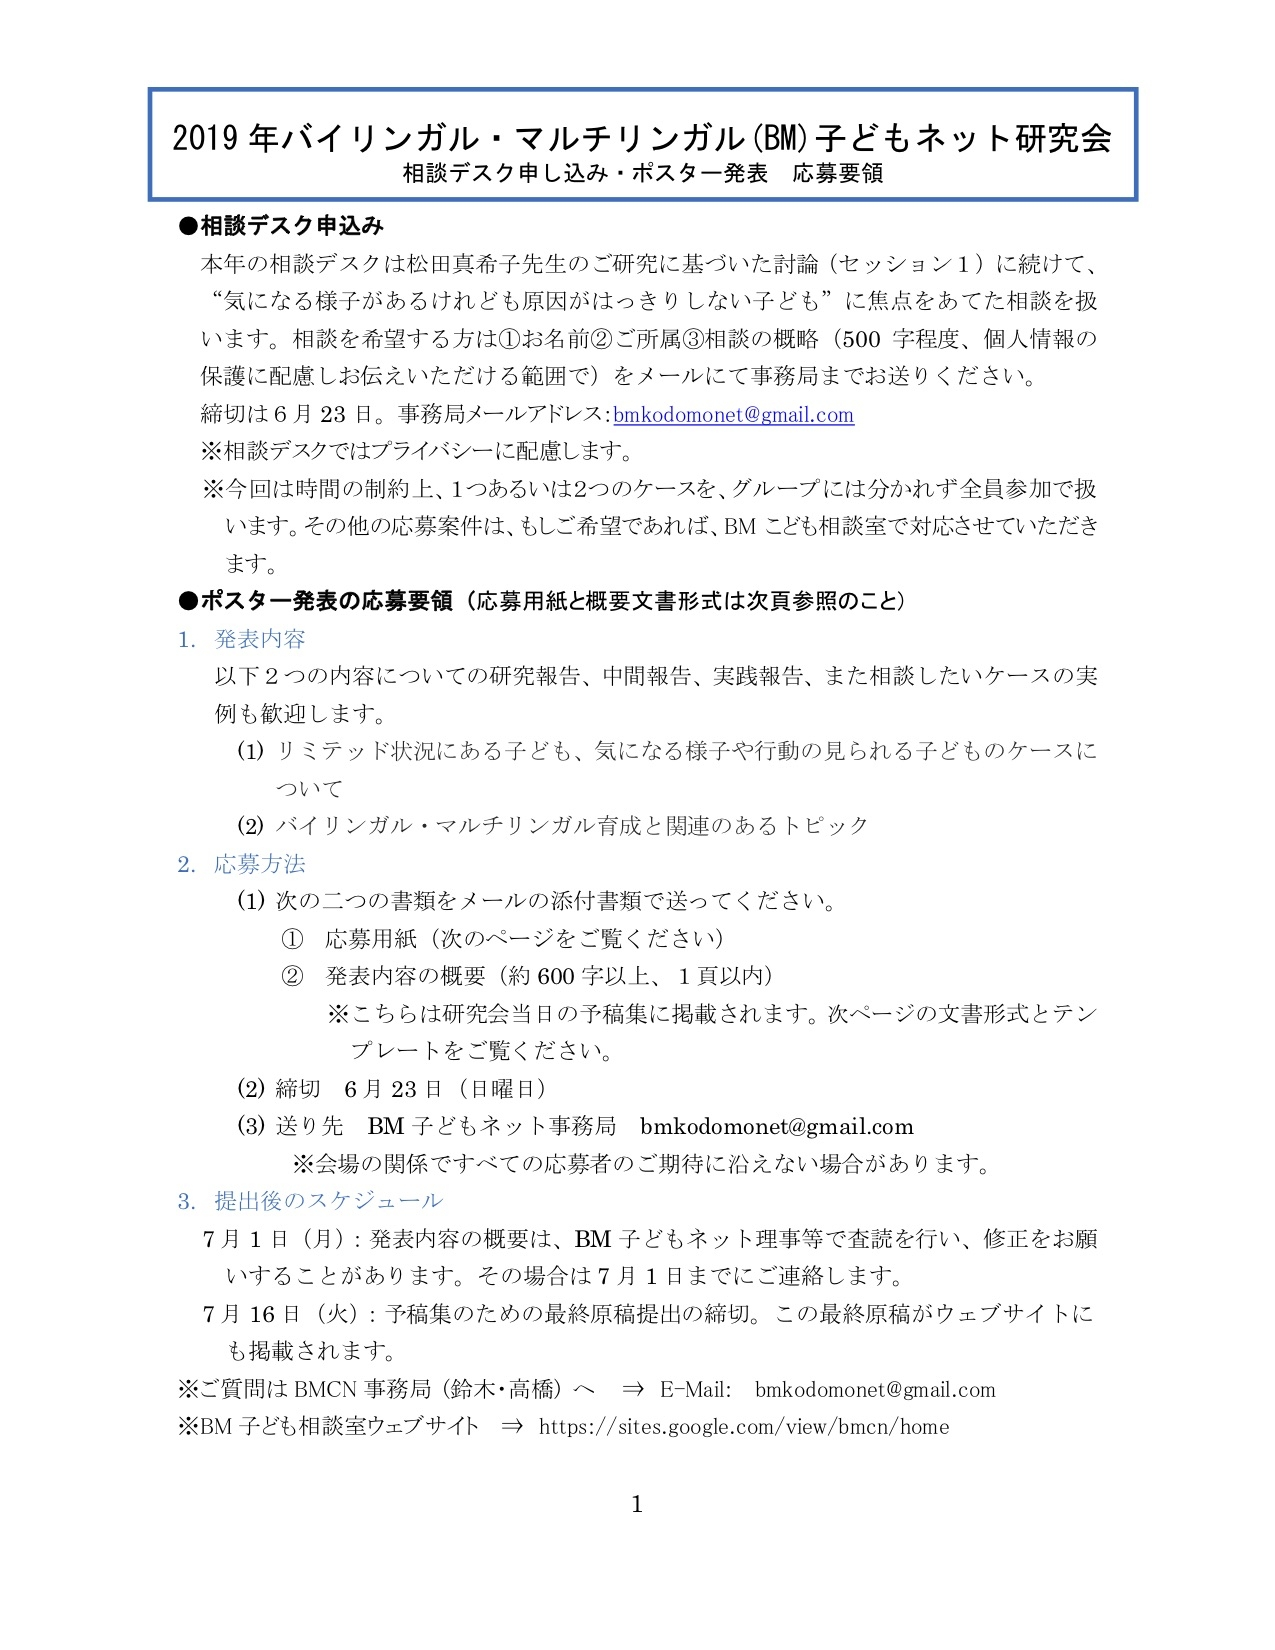 BMCN20190803_DeskPosterAppGuid.jpg